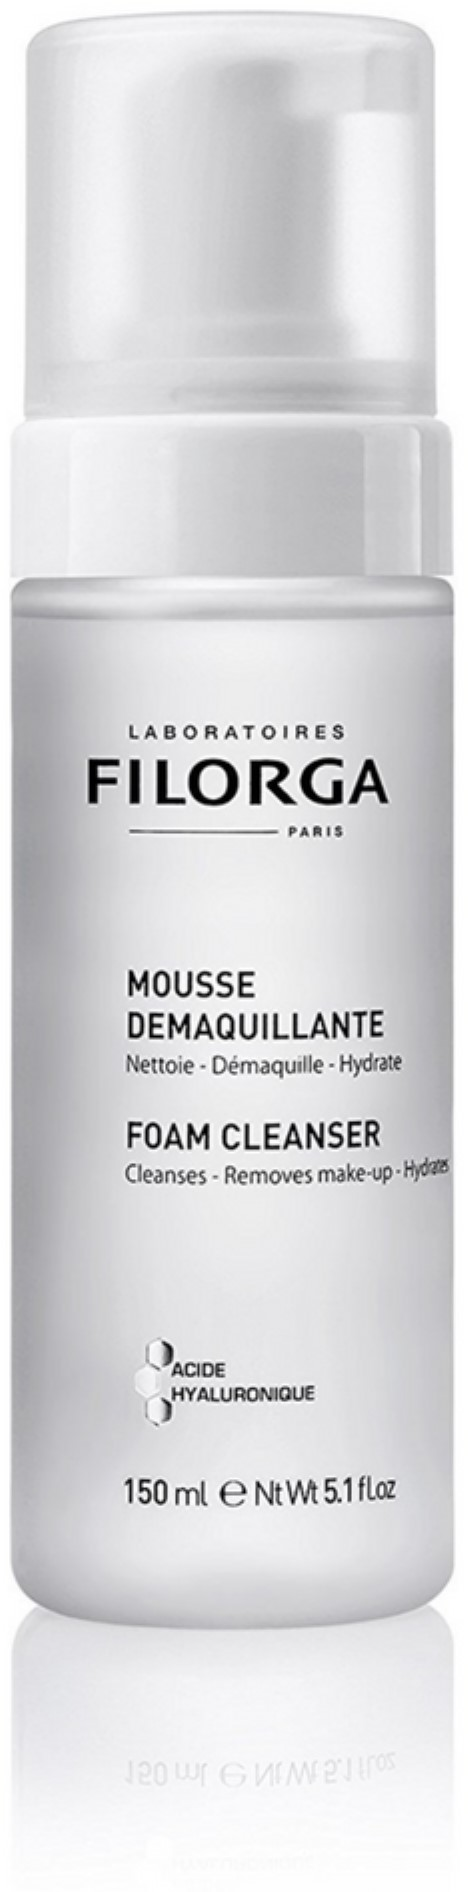 2 Pack - Laboratoires Filorga  Paris 3-in-1 Foam Cleanser 5 oz Kiss Ruby Kisses Bb Cream Rich Beige 1.18 Ounce (35ml) (3 Pack)